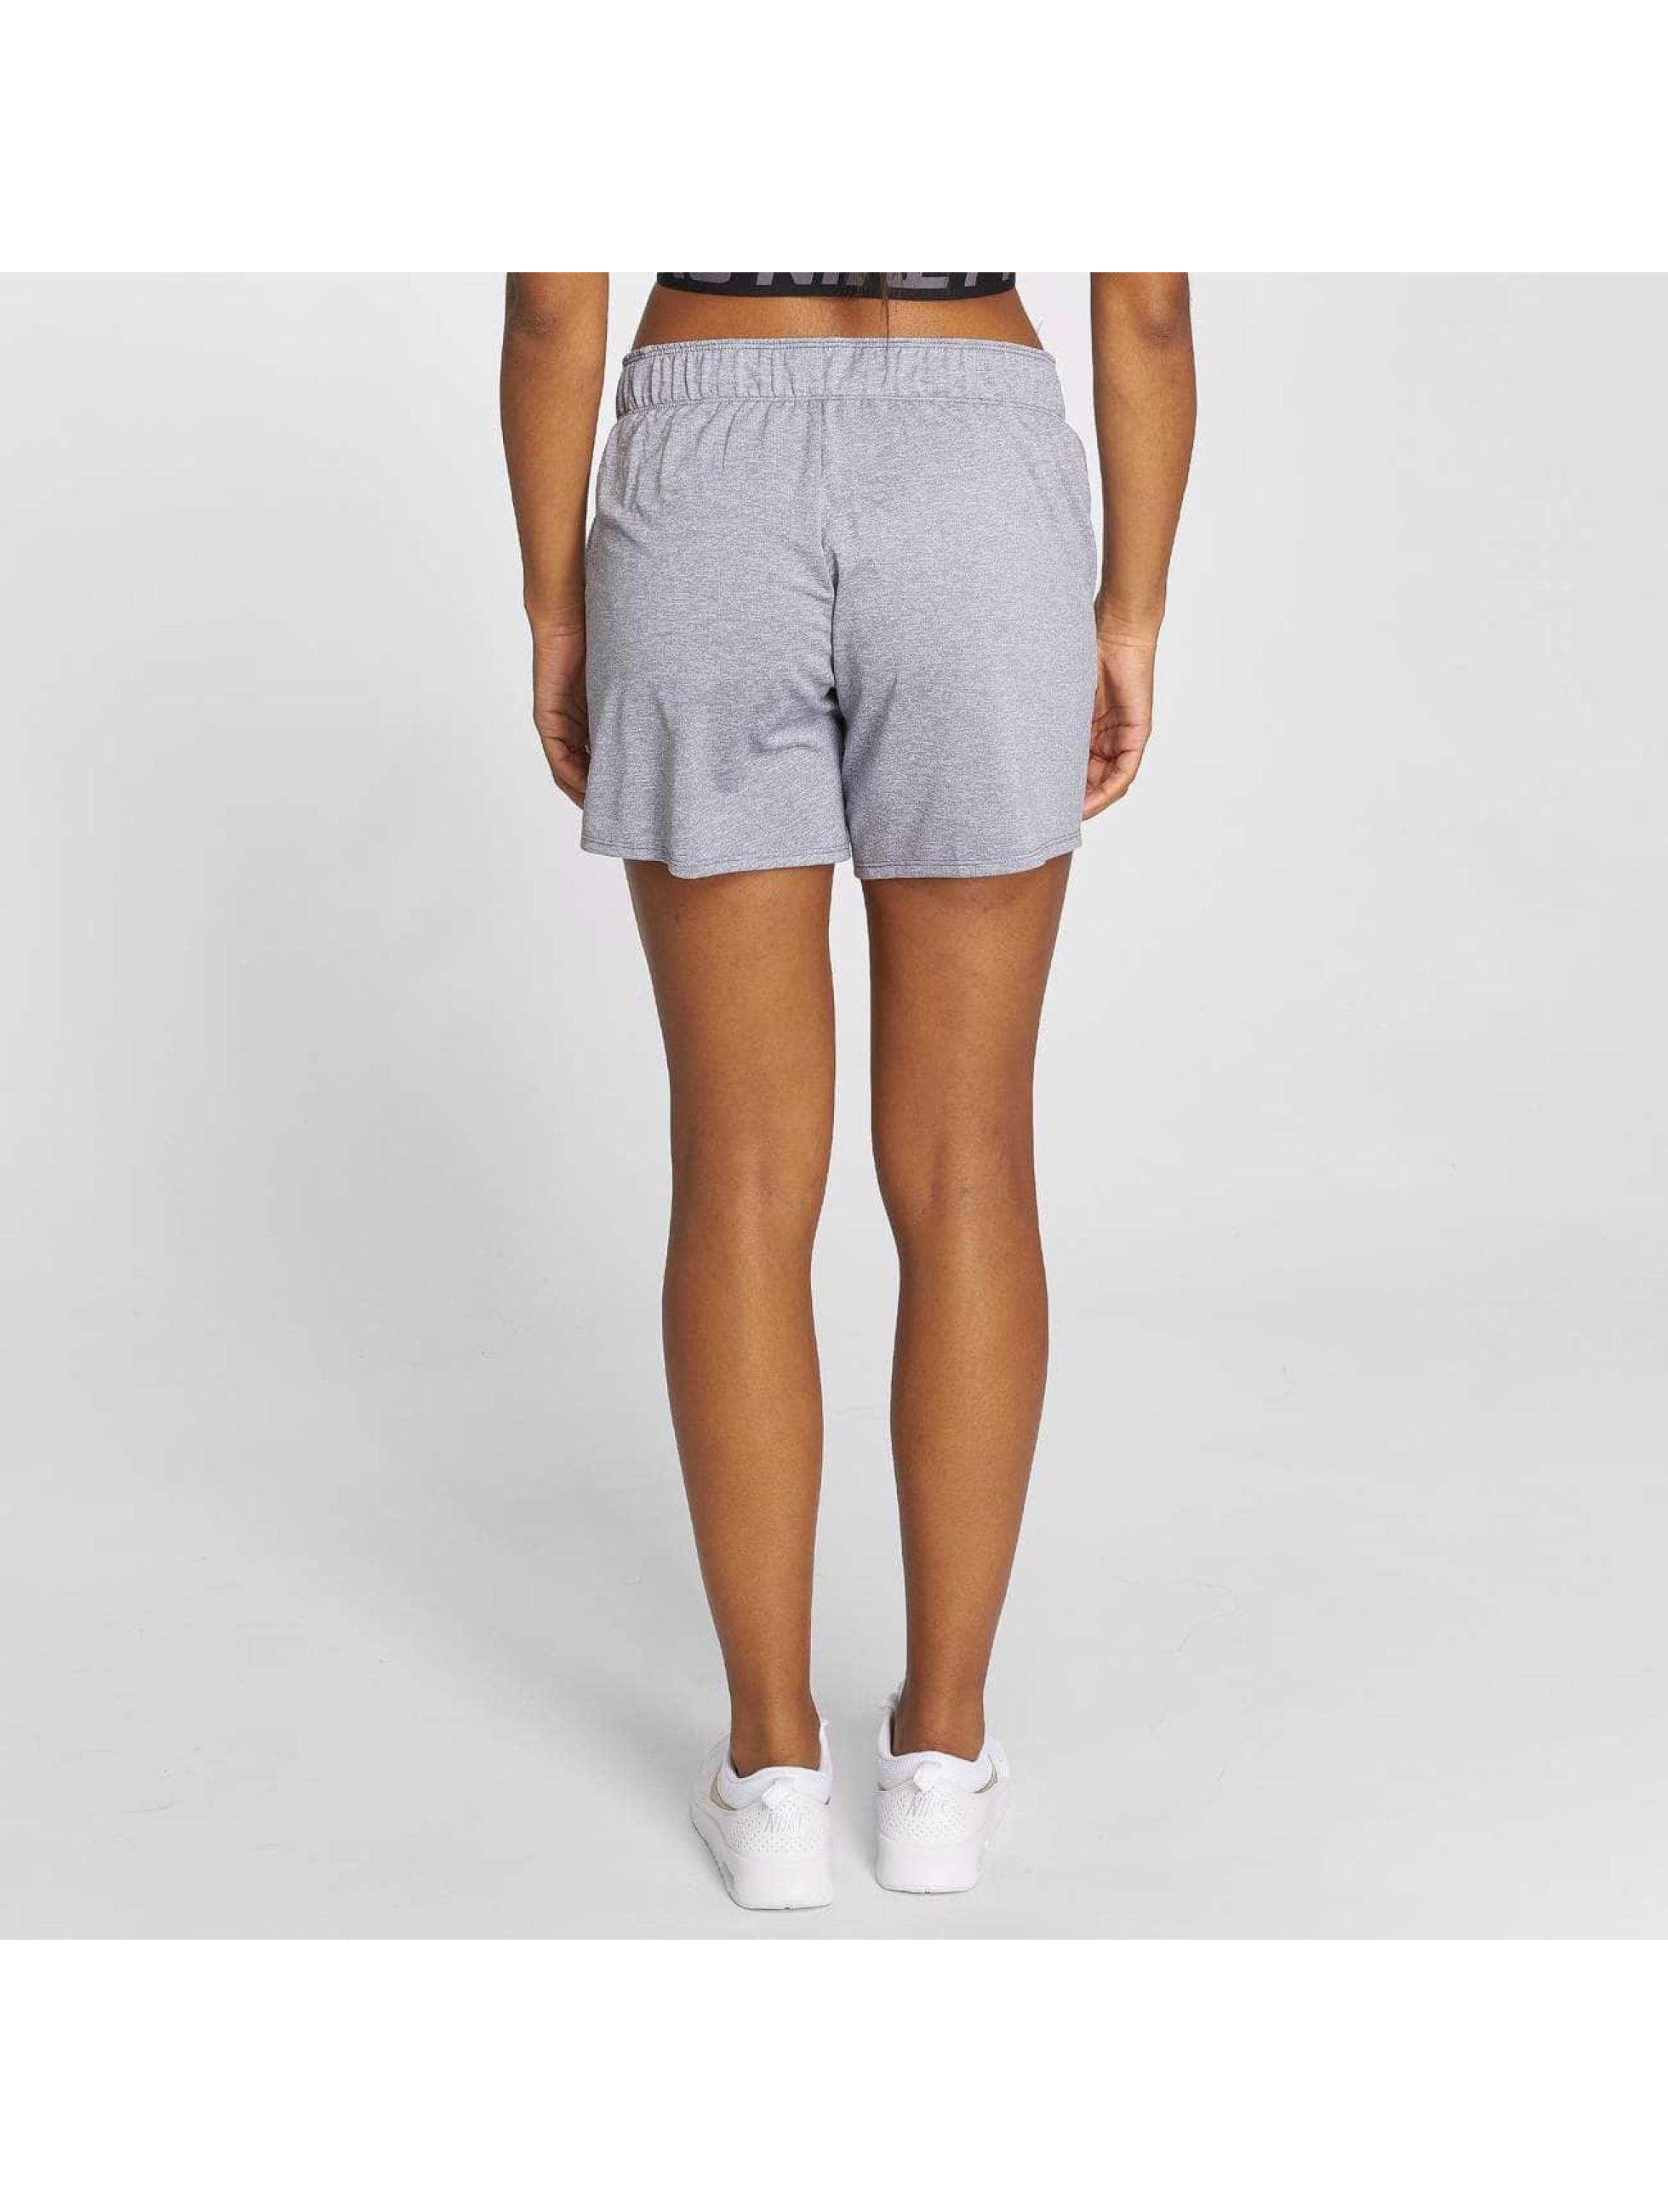 Nike Performance Short Training gray